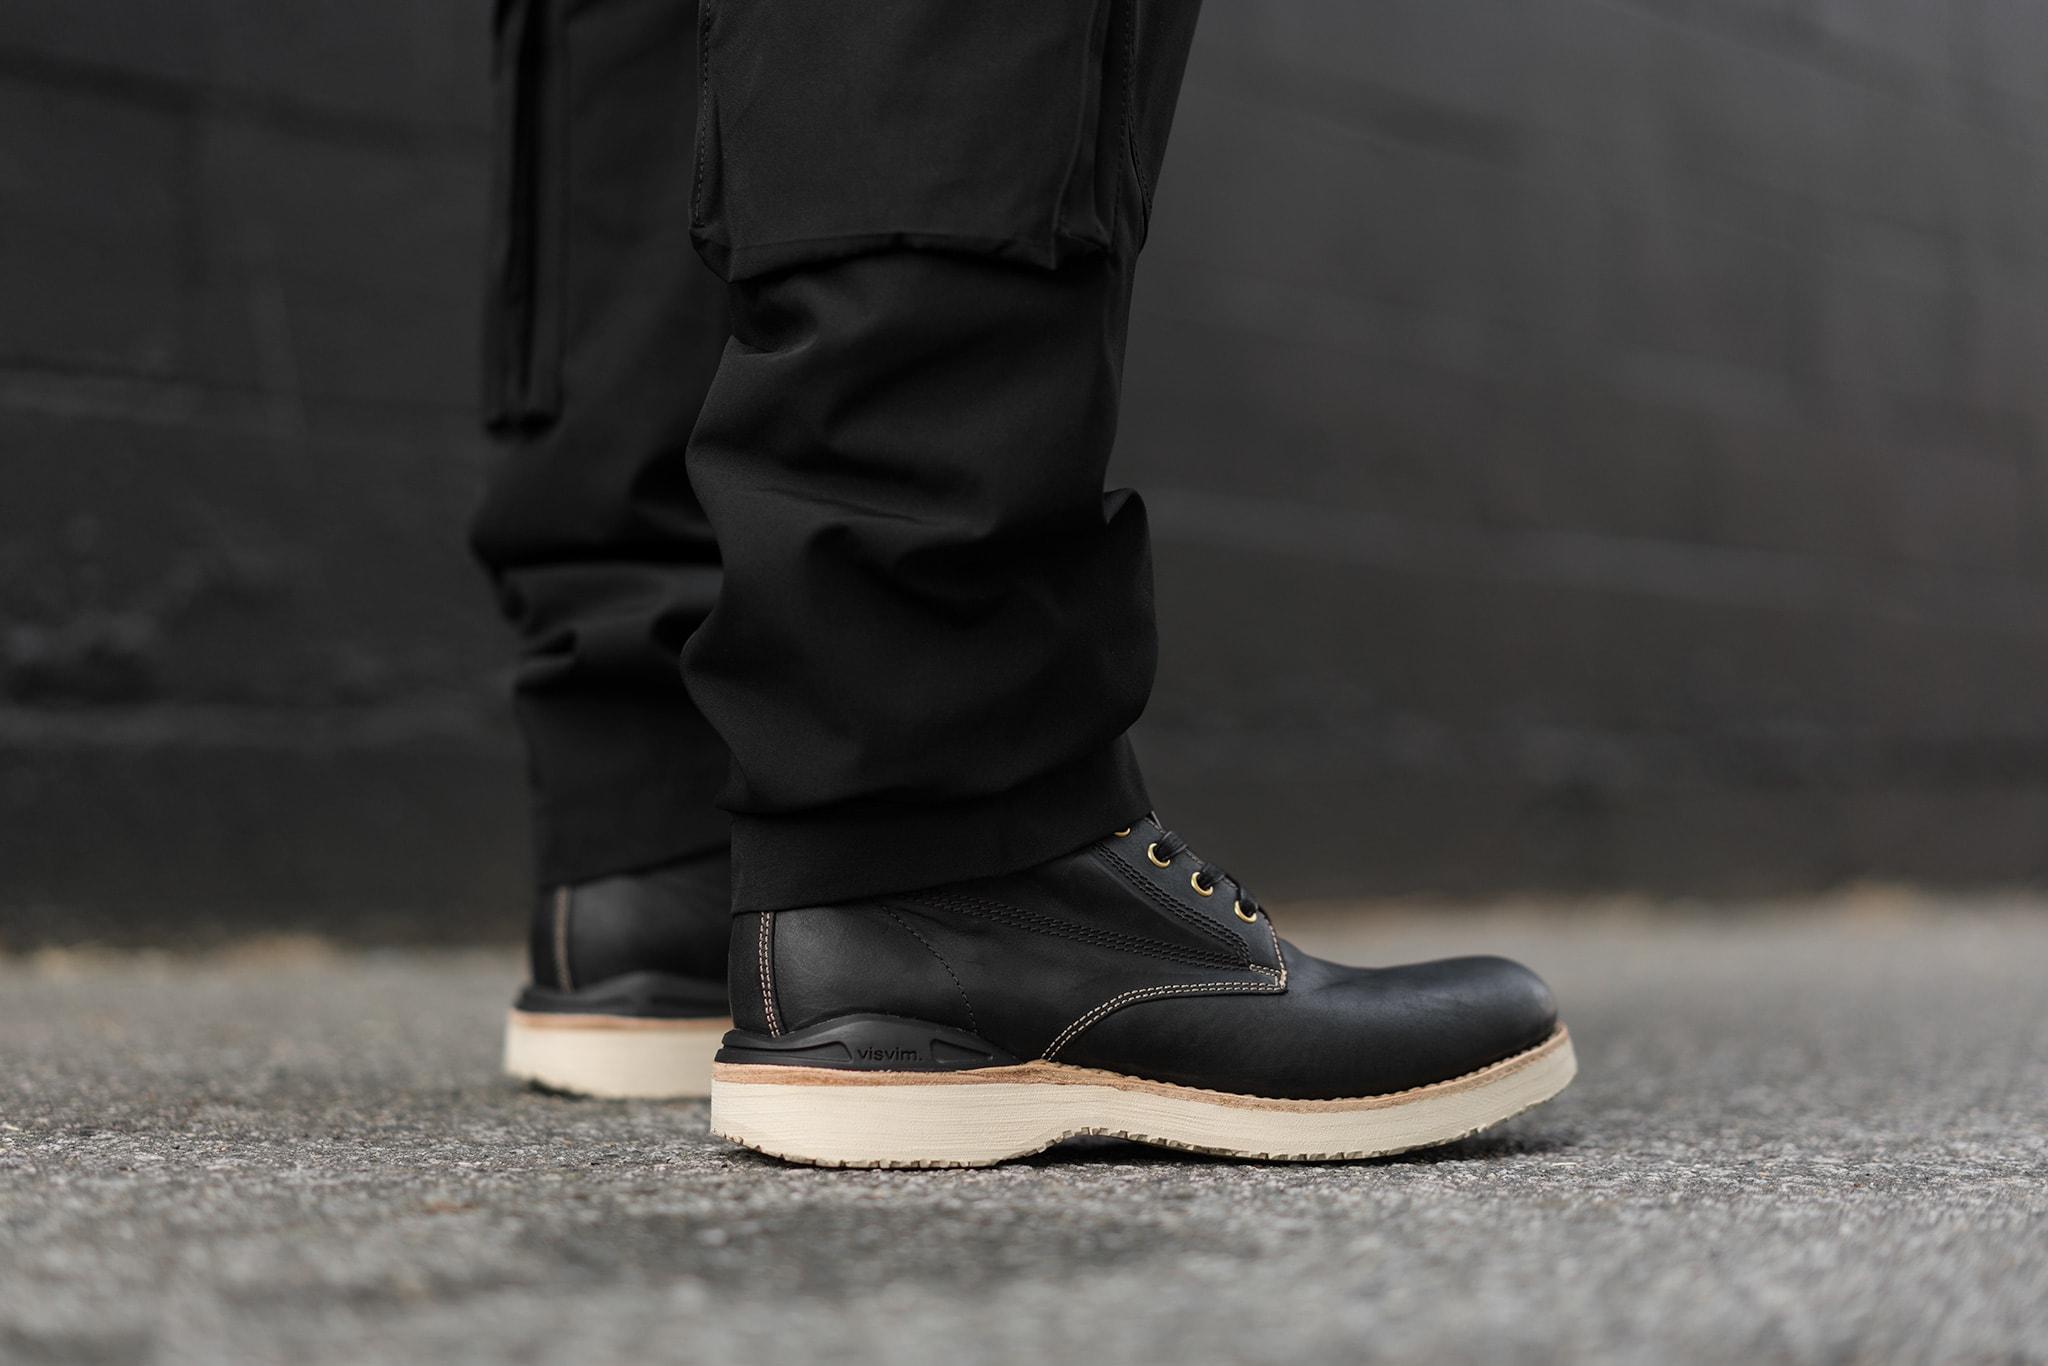 HAVEN Lookbook, visvim Virgil Boots-Folk (KNGR) Black